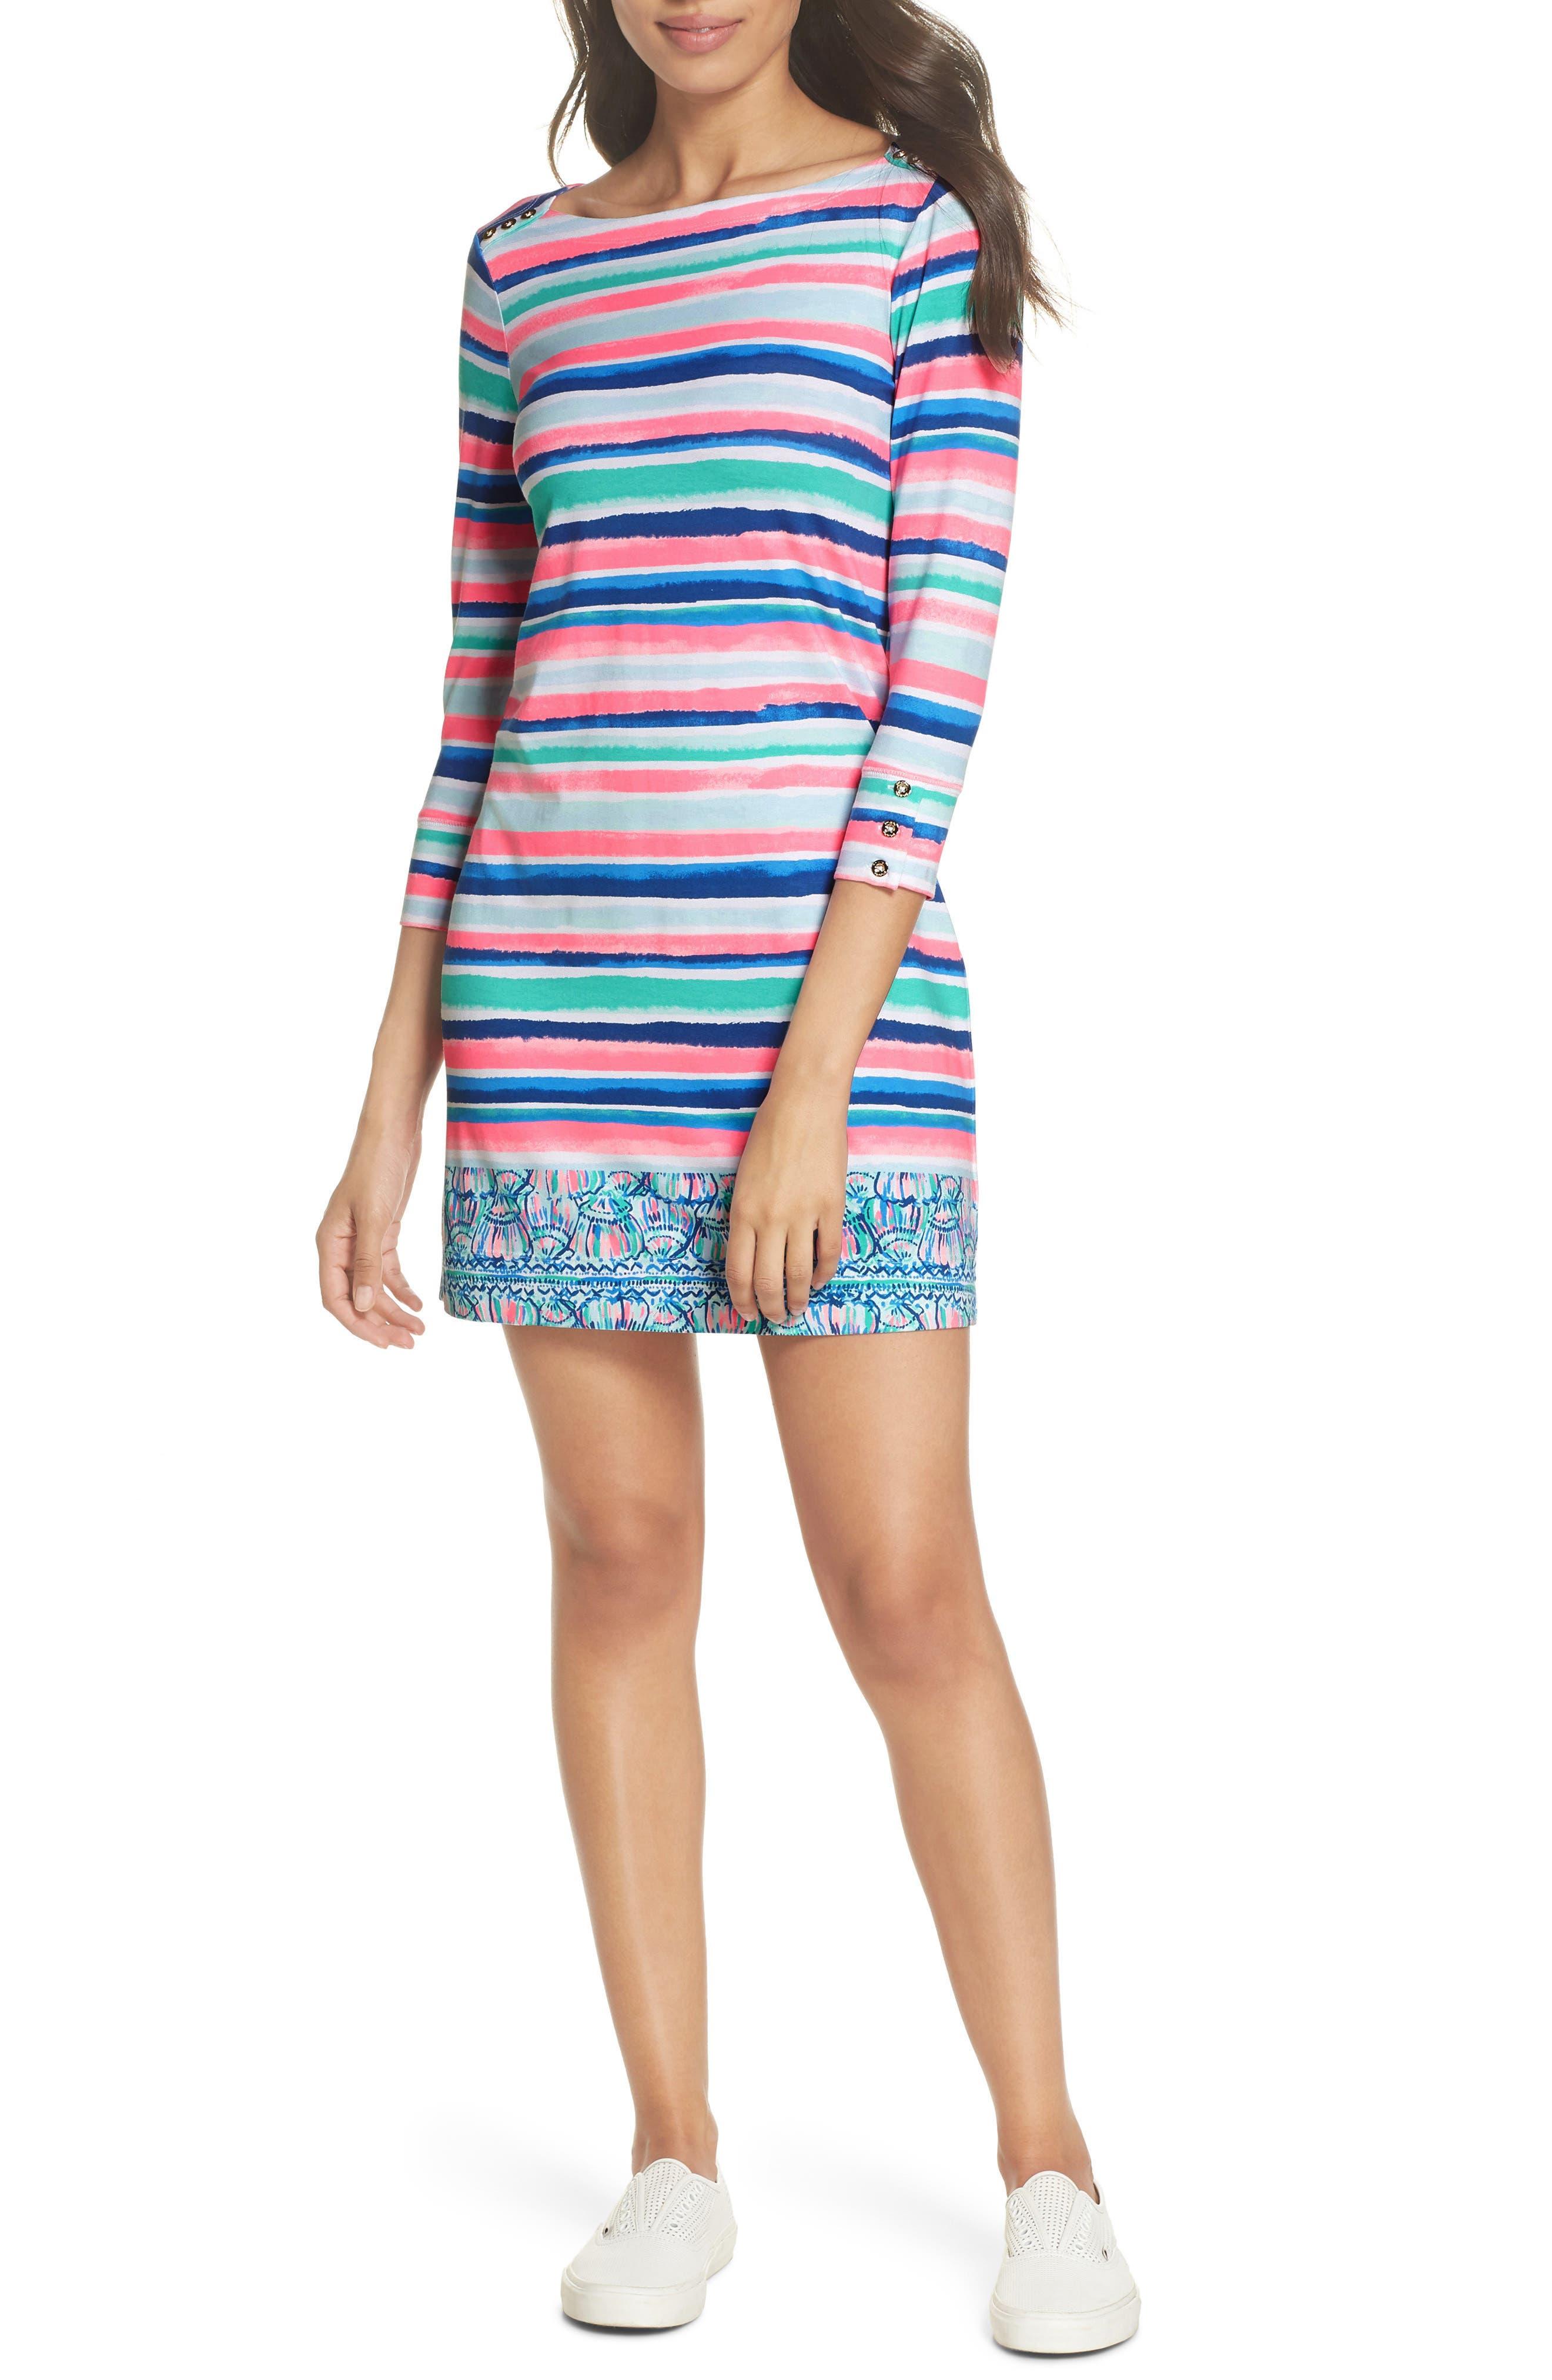 Sophie UPF 50+ Dress,                         Main,                         color, MULTI SANDY SHELL STRIPE